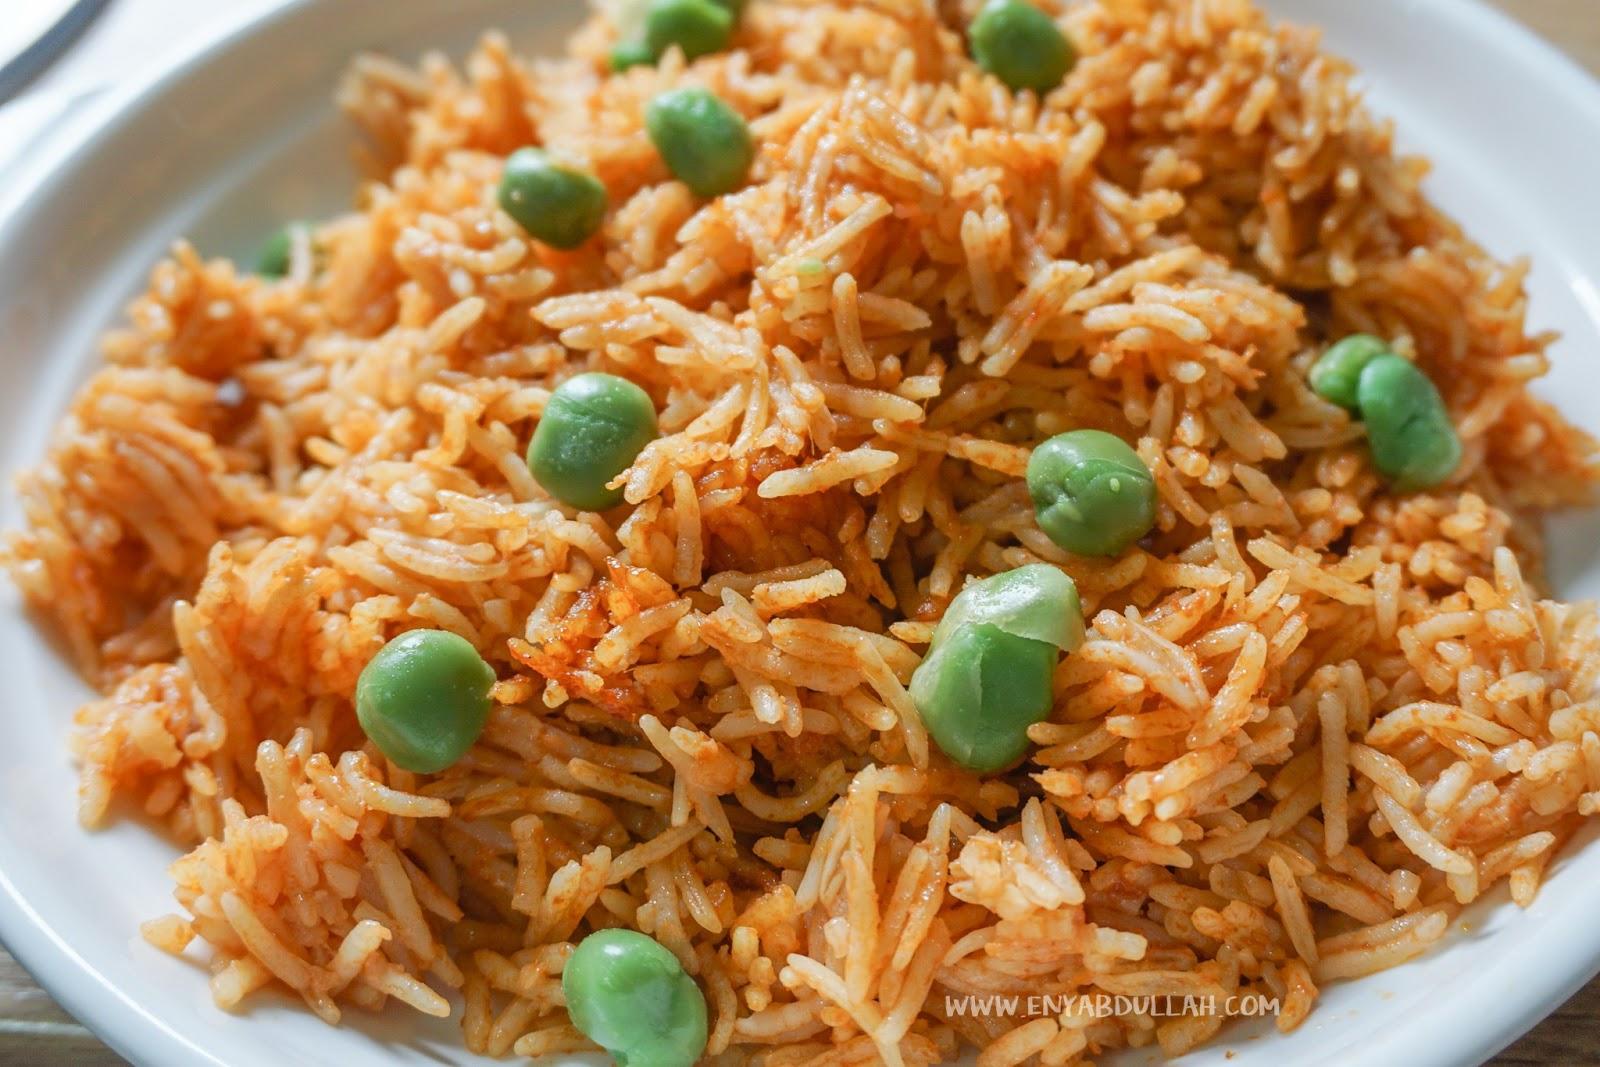 Resepi Nasi Tomato Guna Periuk Noxxa - Percontohan q